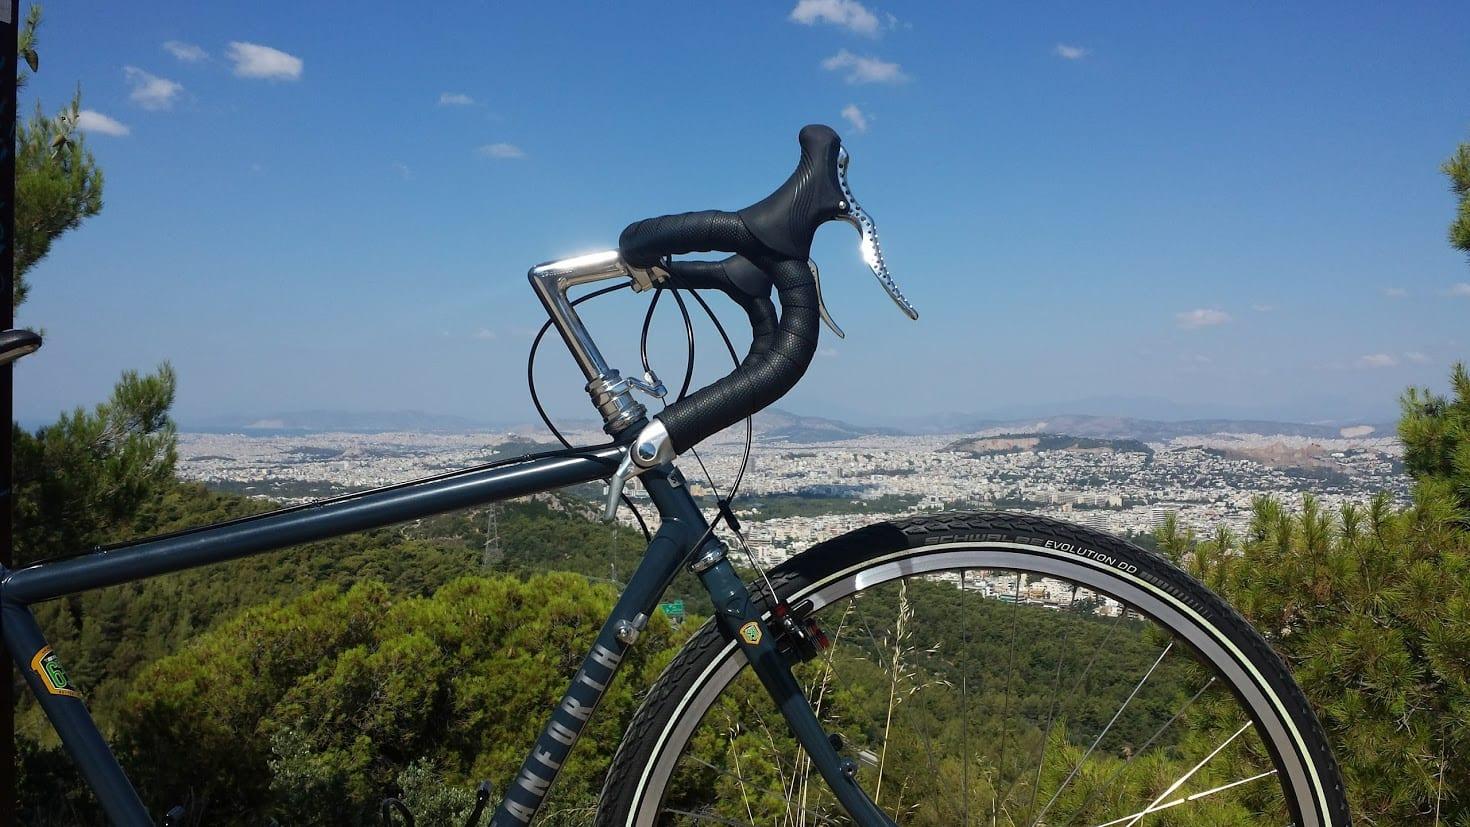 Schwalbe tires on my Stanforth Skyelander touring bike